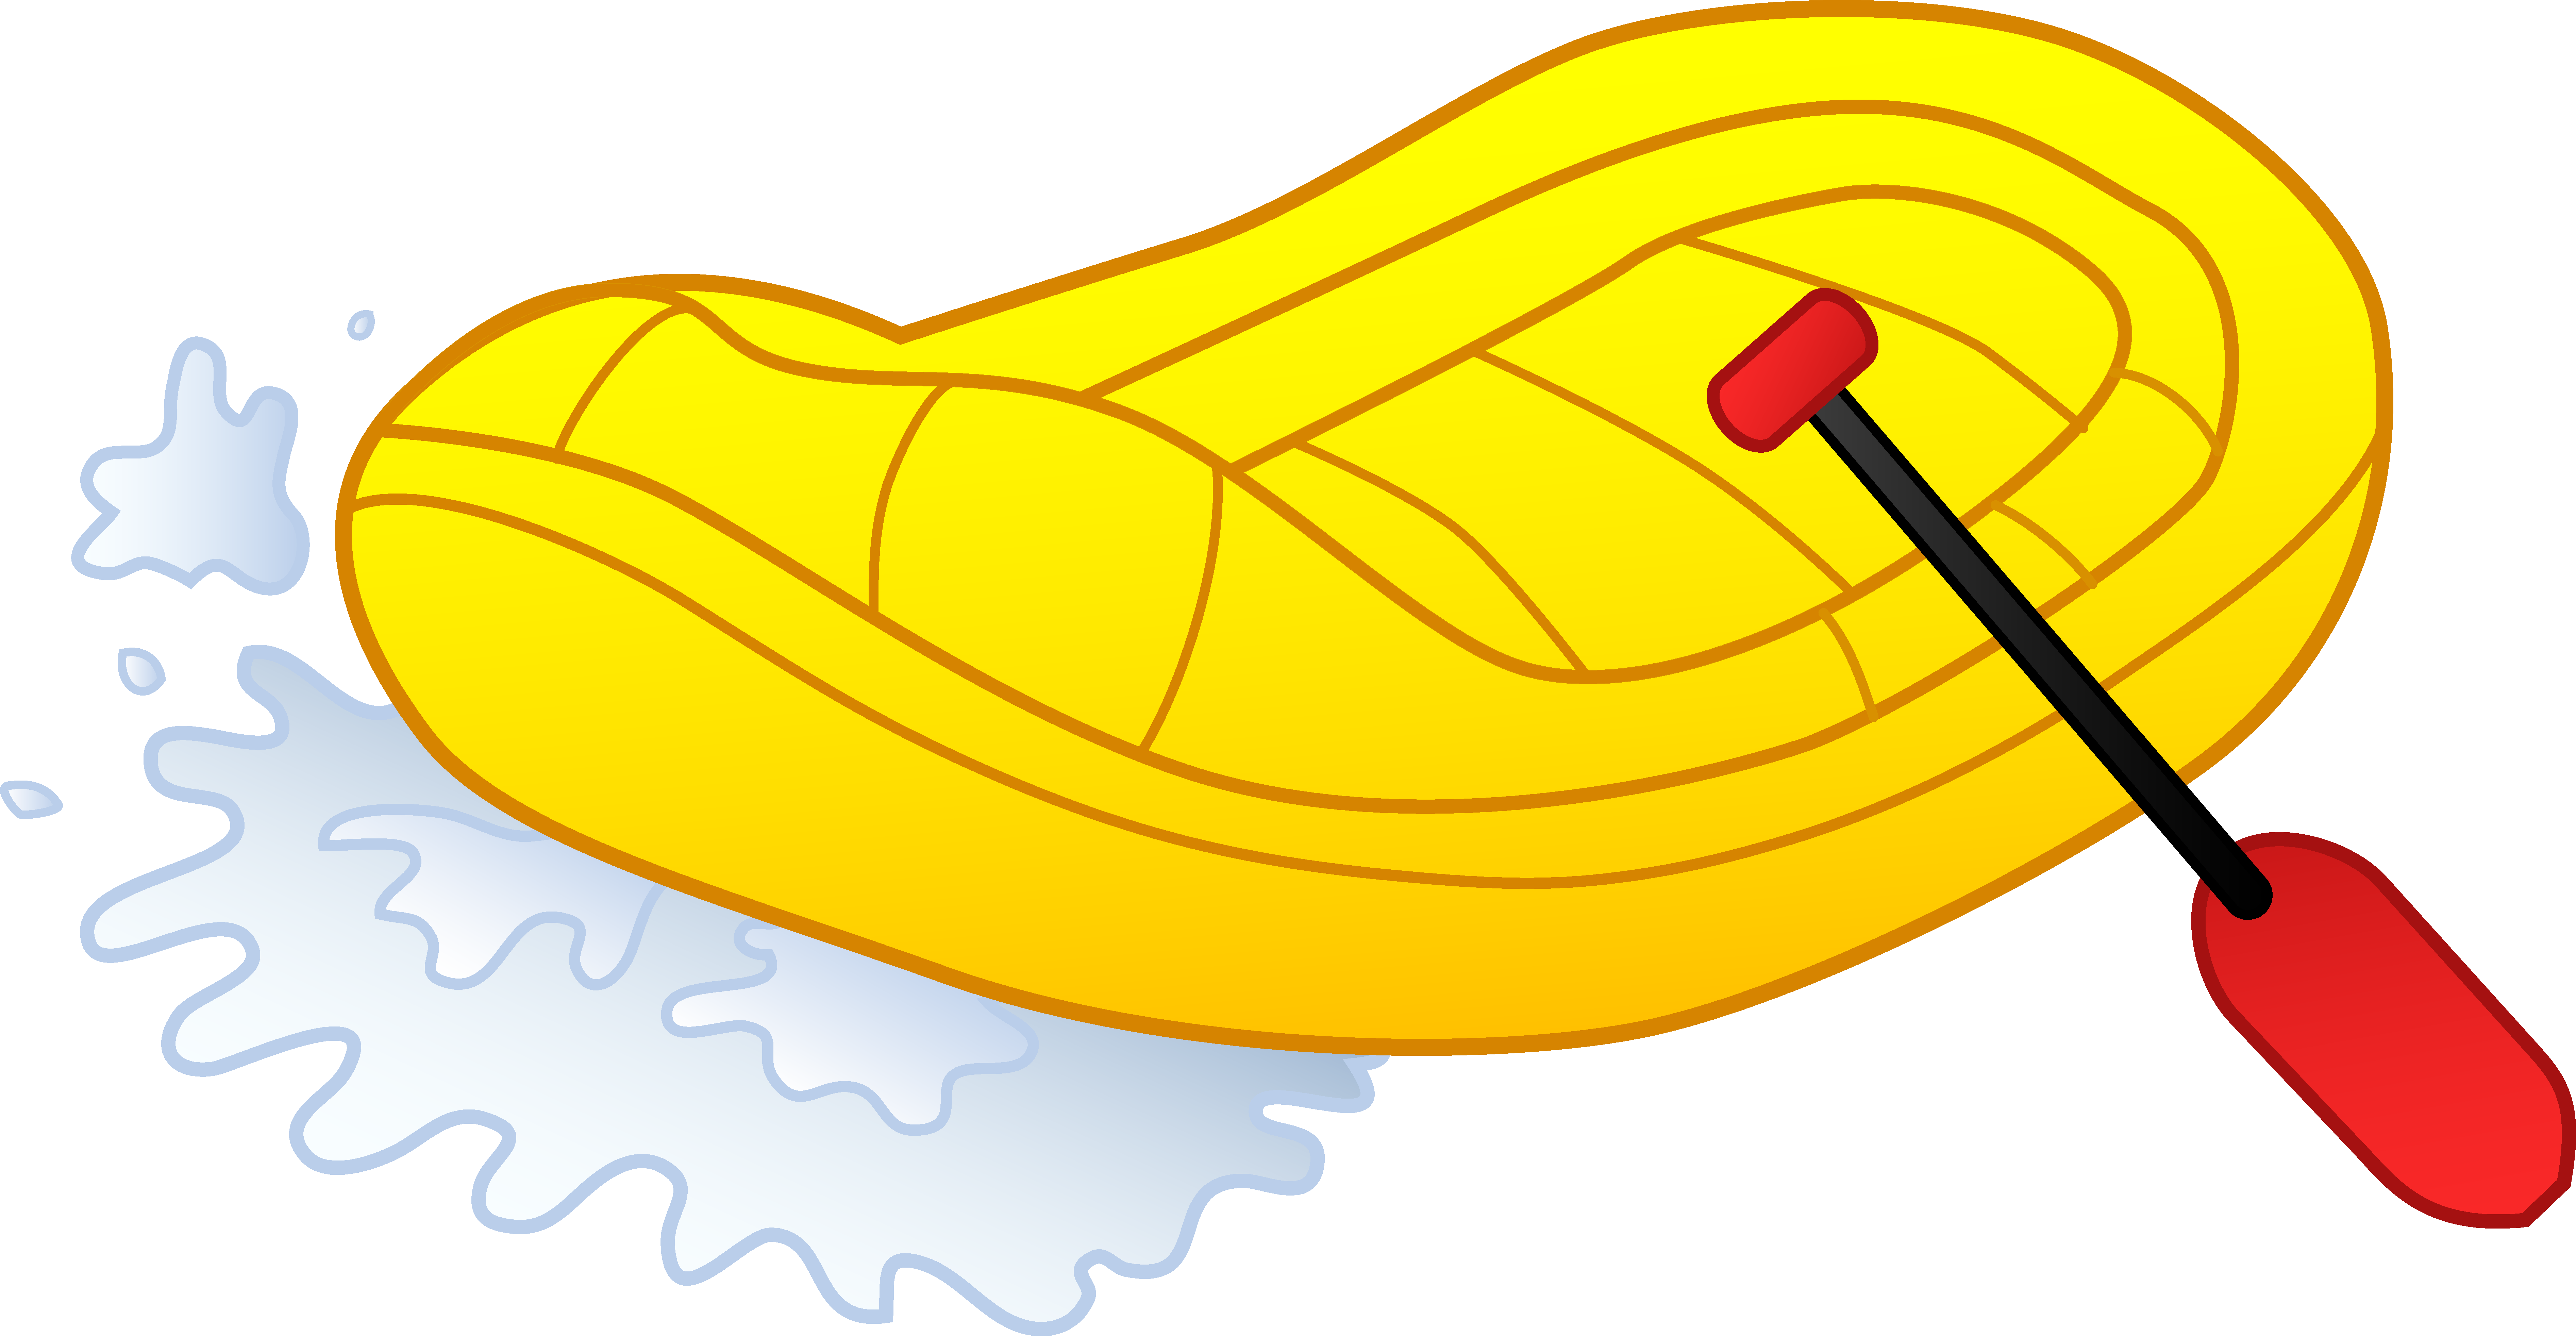 Rafting clipart white water rafting River Art Rafting Illustration Yellow